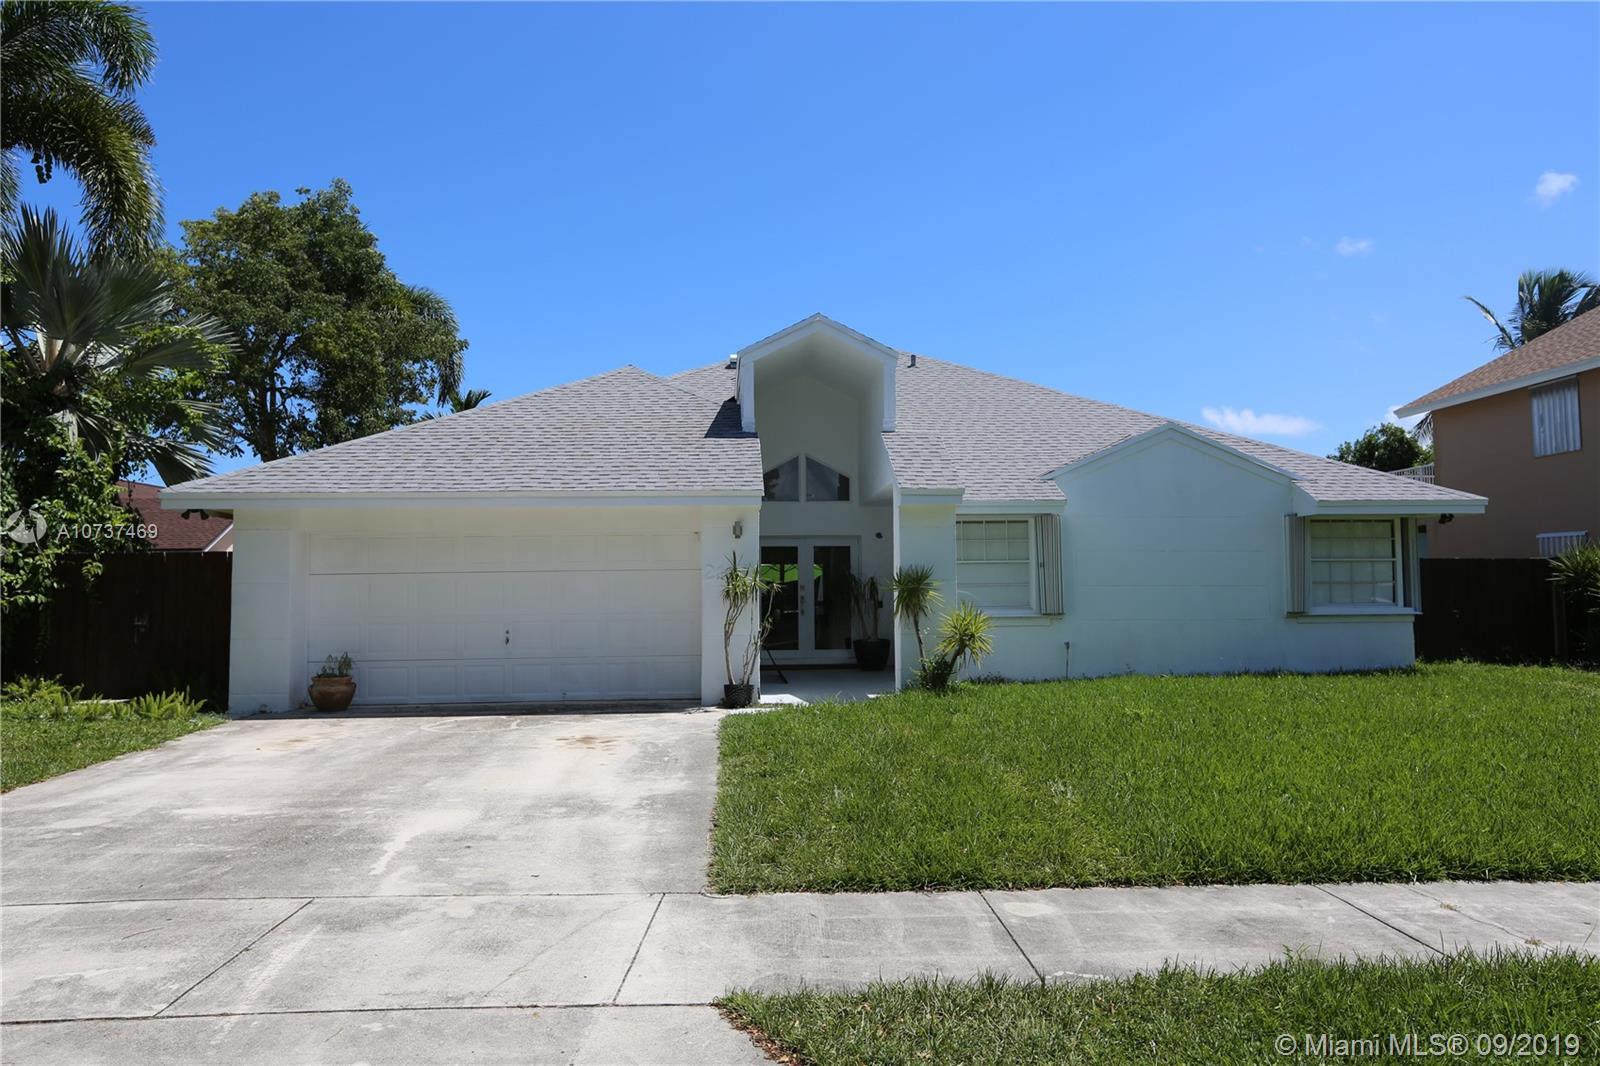 21831 SW 98th Ave, Cutler Bay, FL 33190